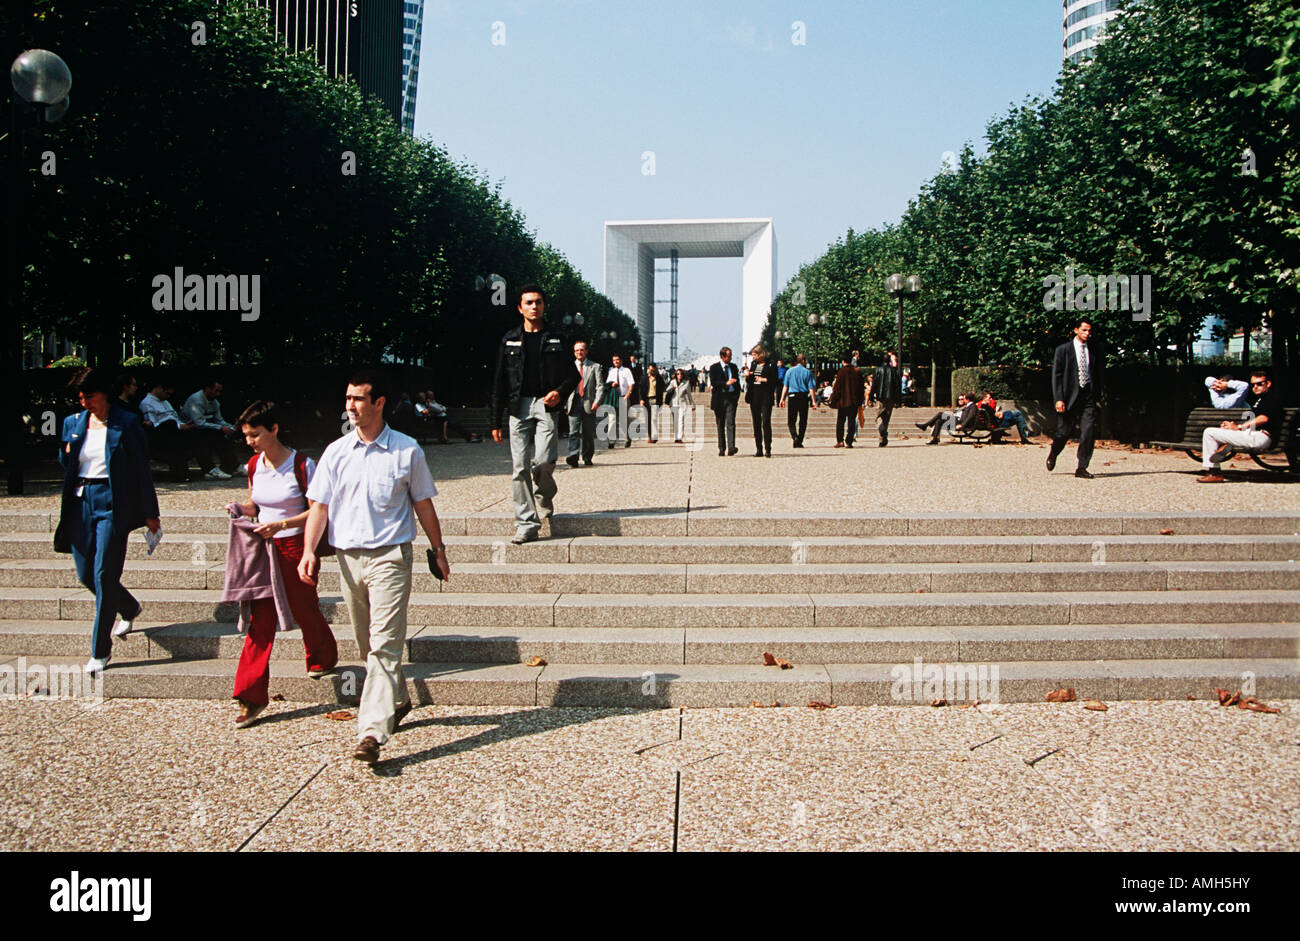 People walking near La Grande Arche de la Defense, Paris, France Stock Photo